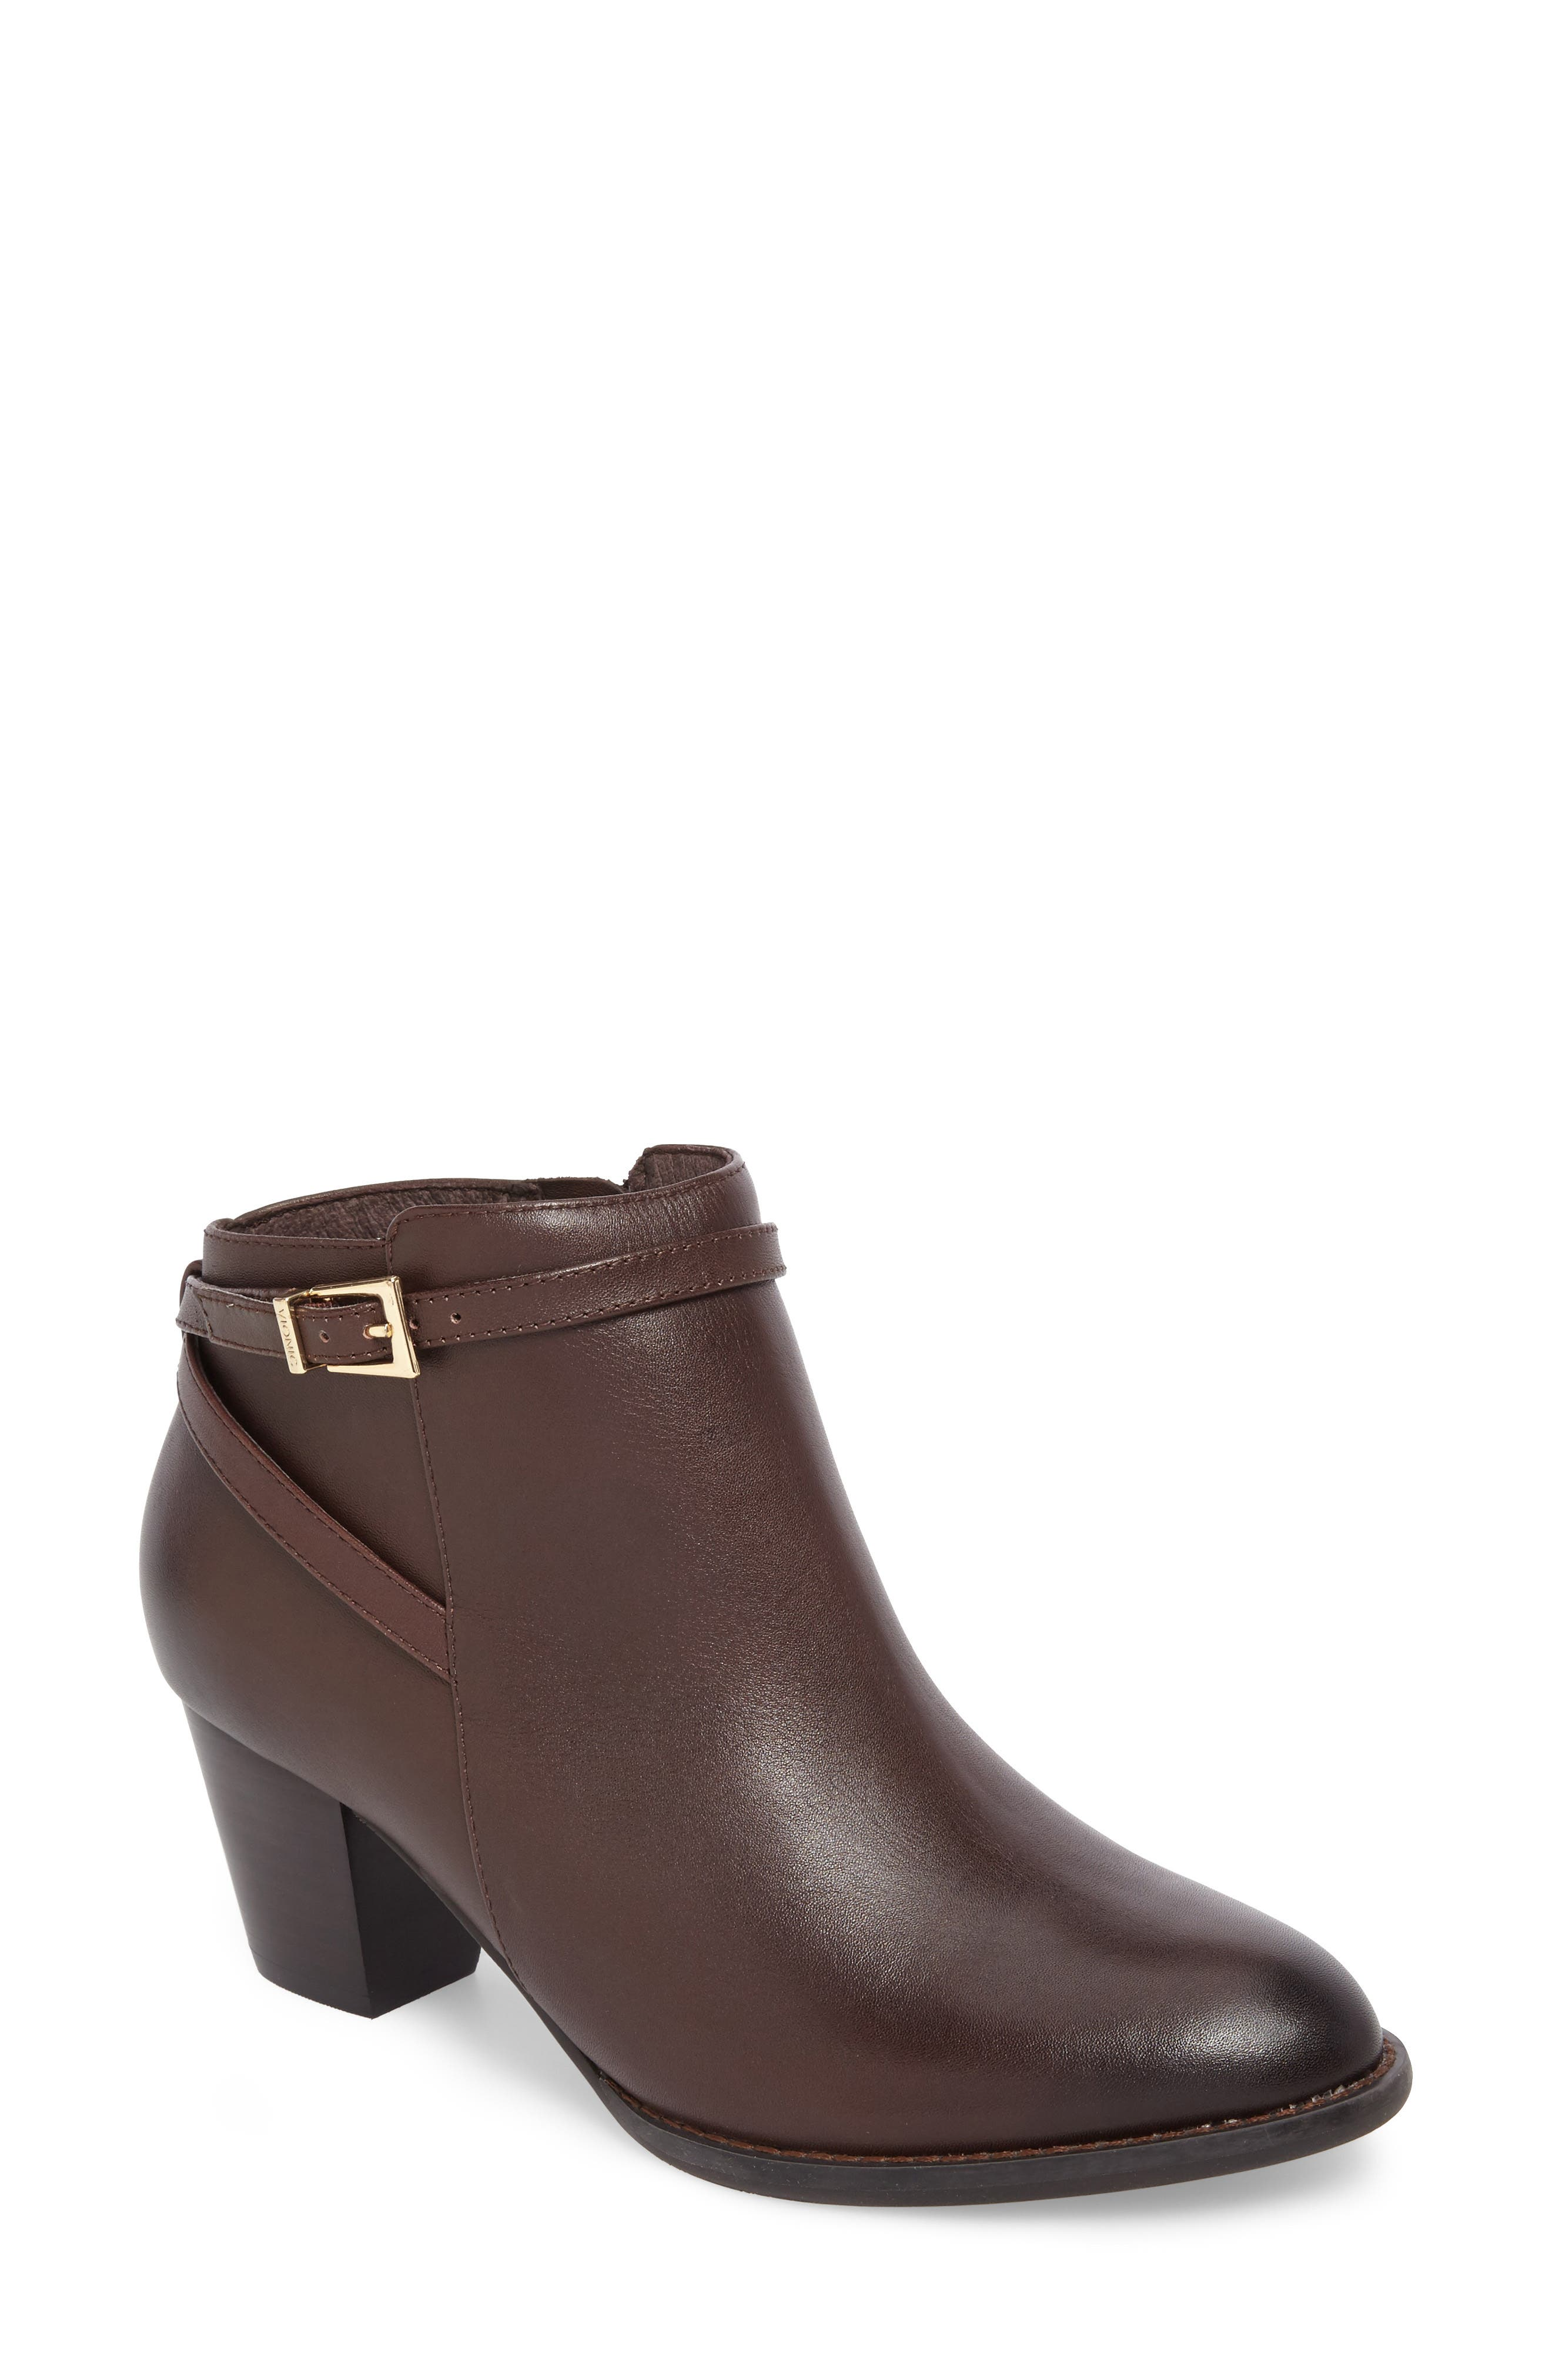 'Upton' Block Heel Boot,                             Main thumbnail 1, color,